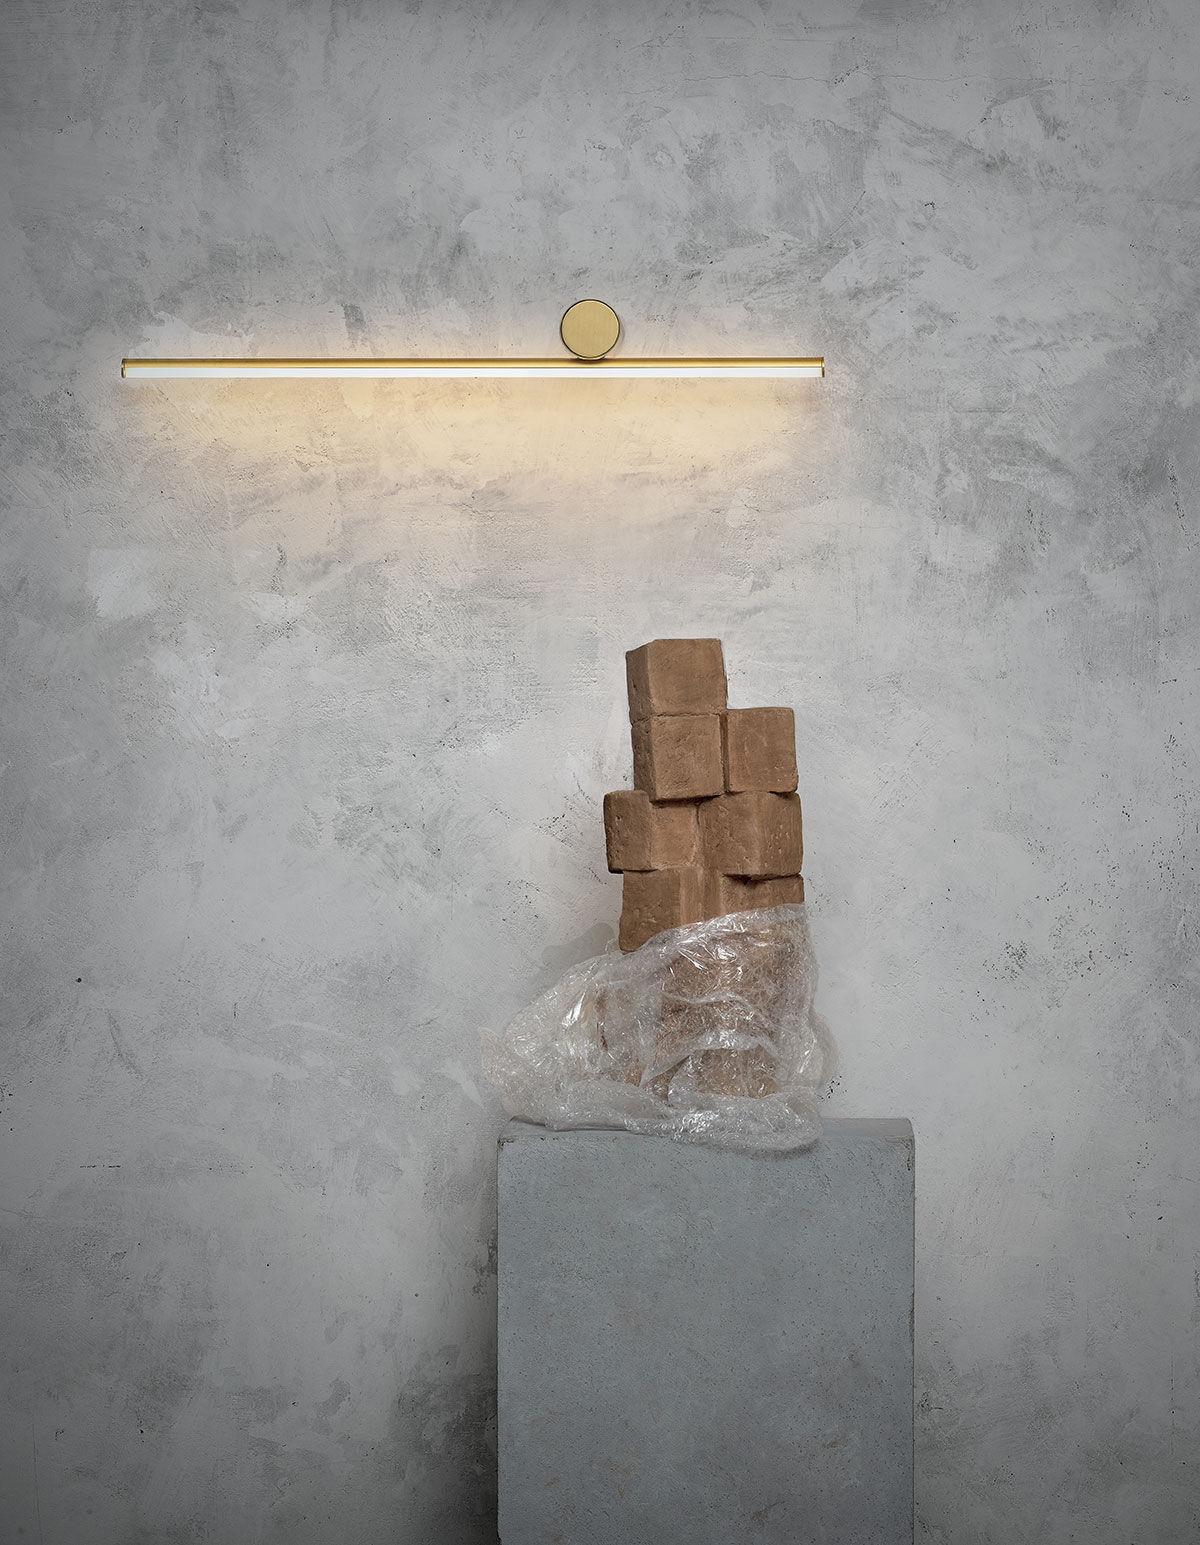 stories-coordinates-wall-michael-anastassiades-flos-02